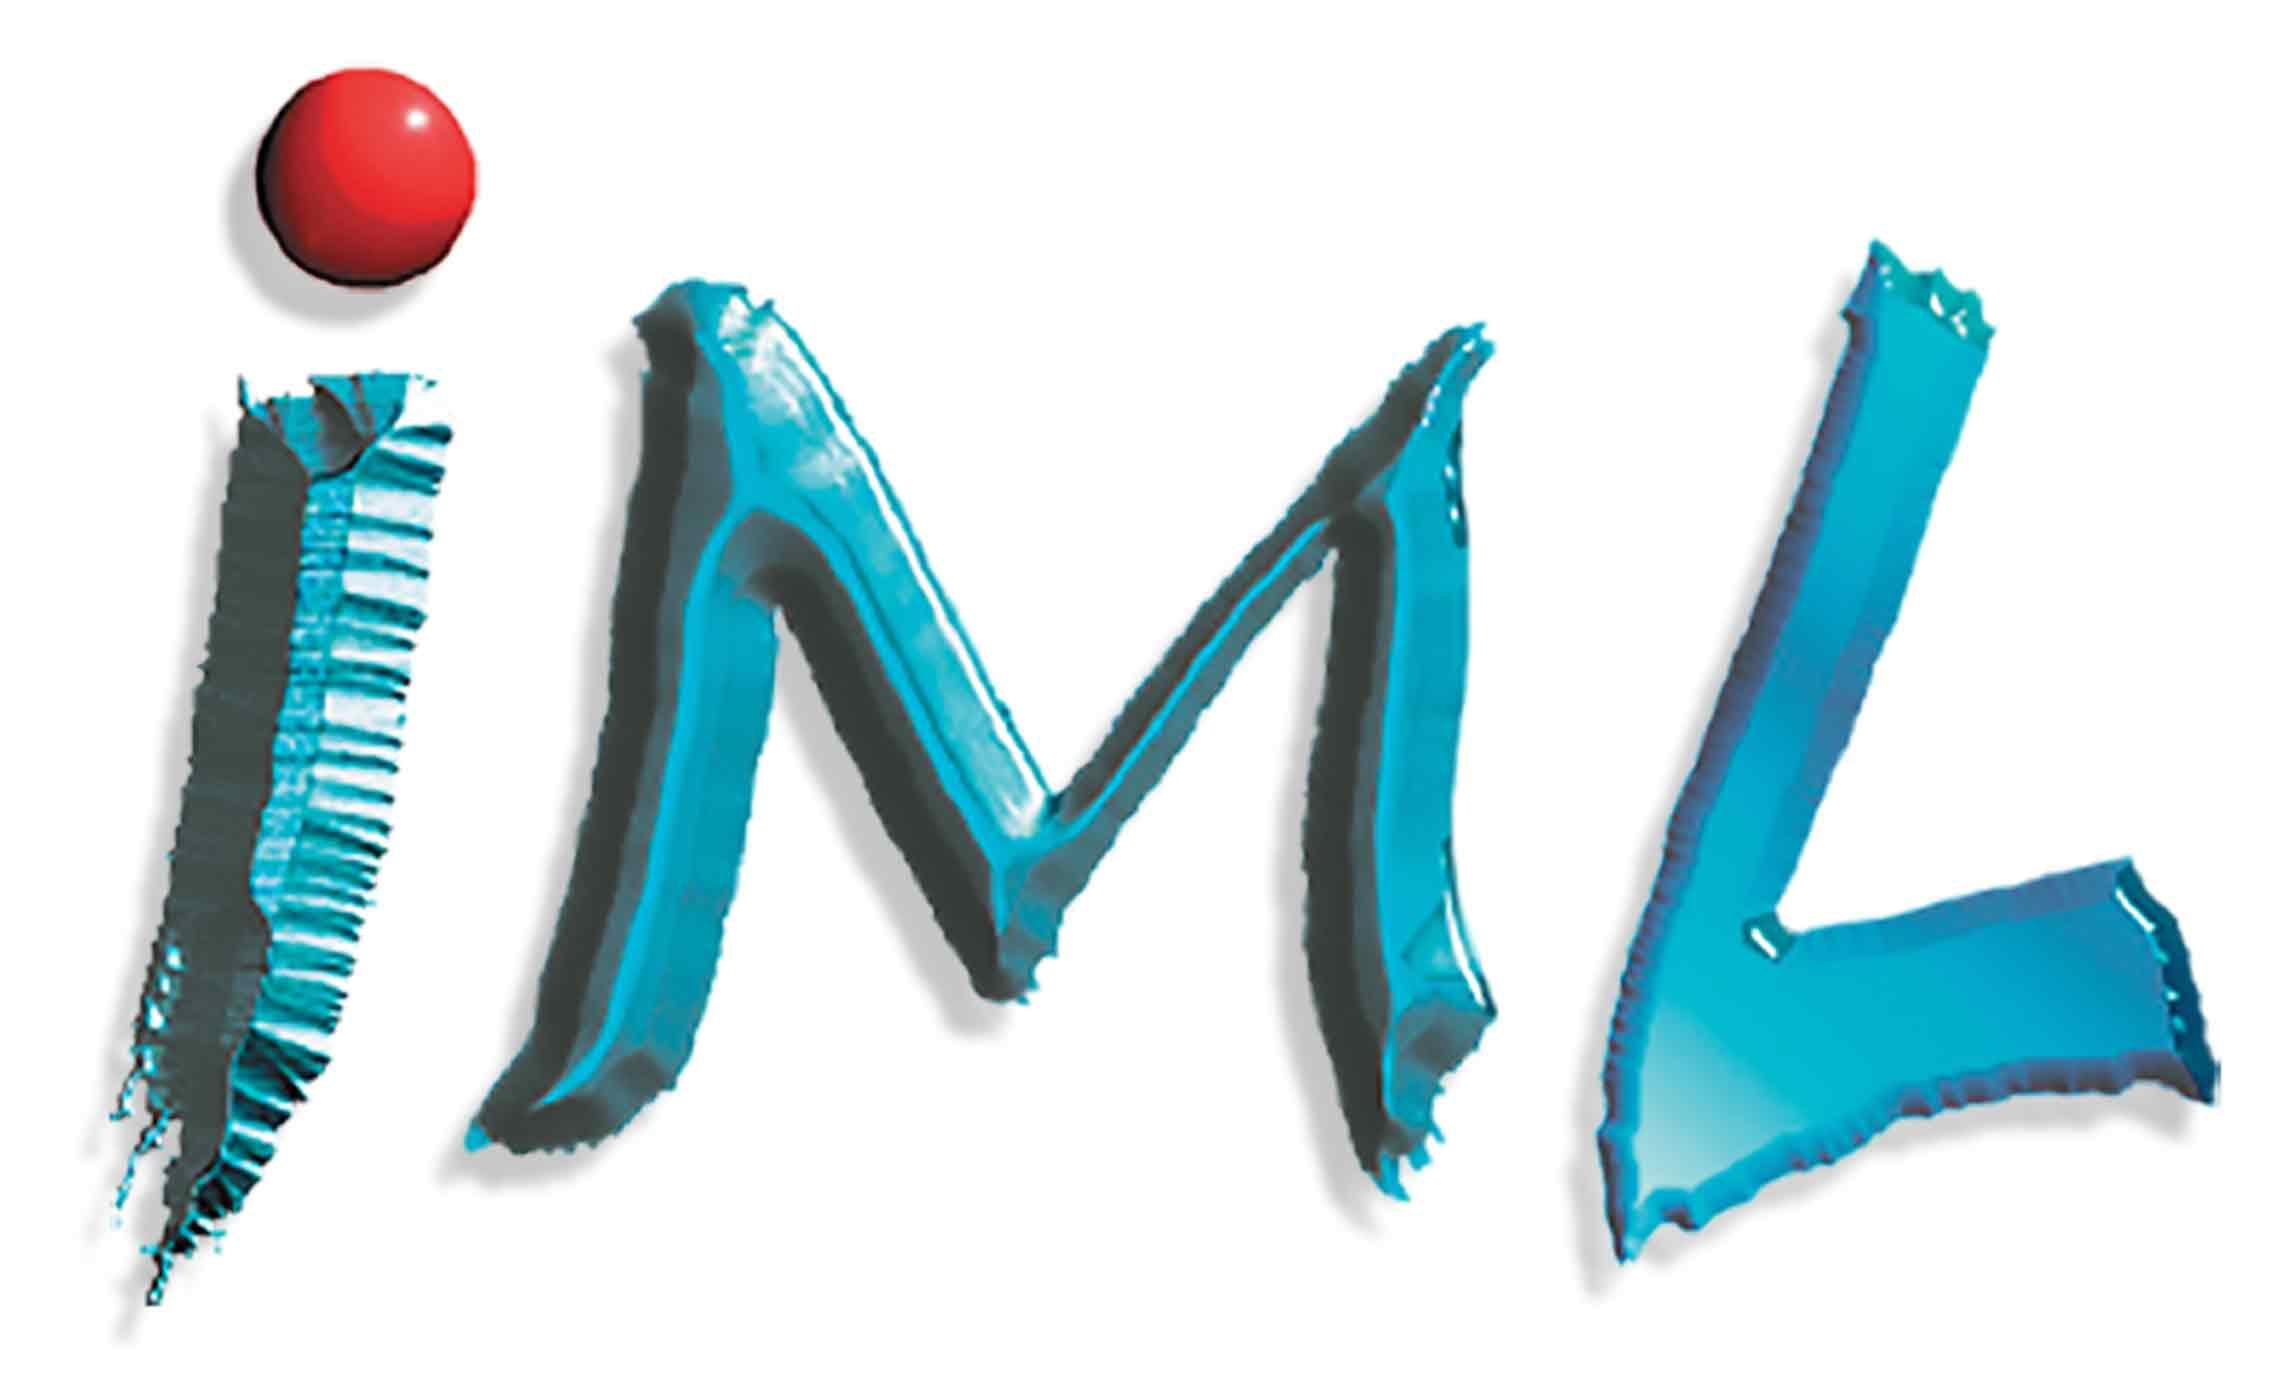 IML LOGO - IML Digital Media